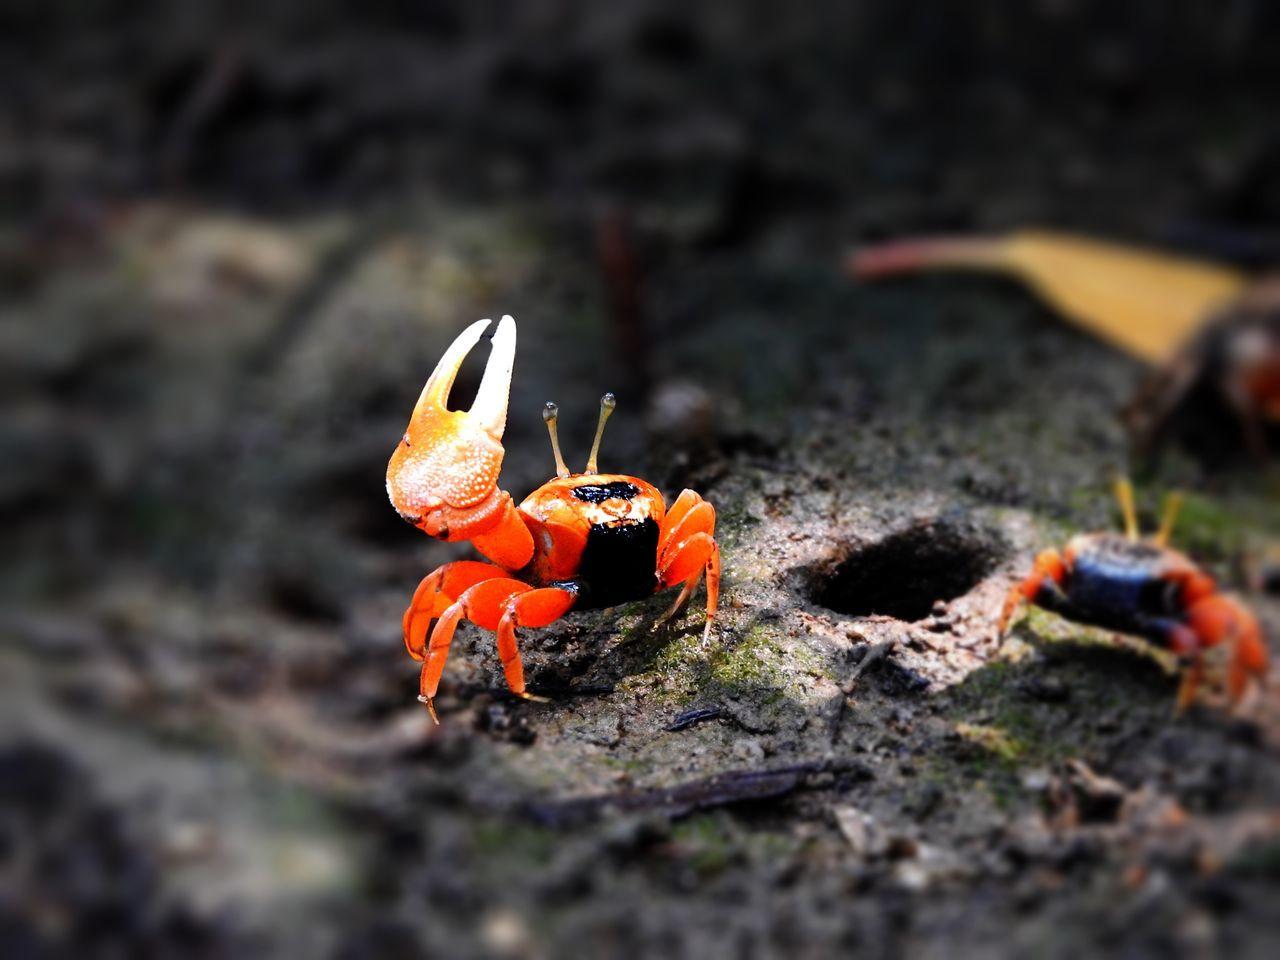 Red Crab Tadda Community EyeEm Nature Lover Seaside Wanna fighting?